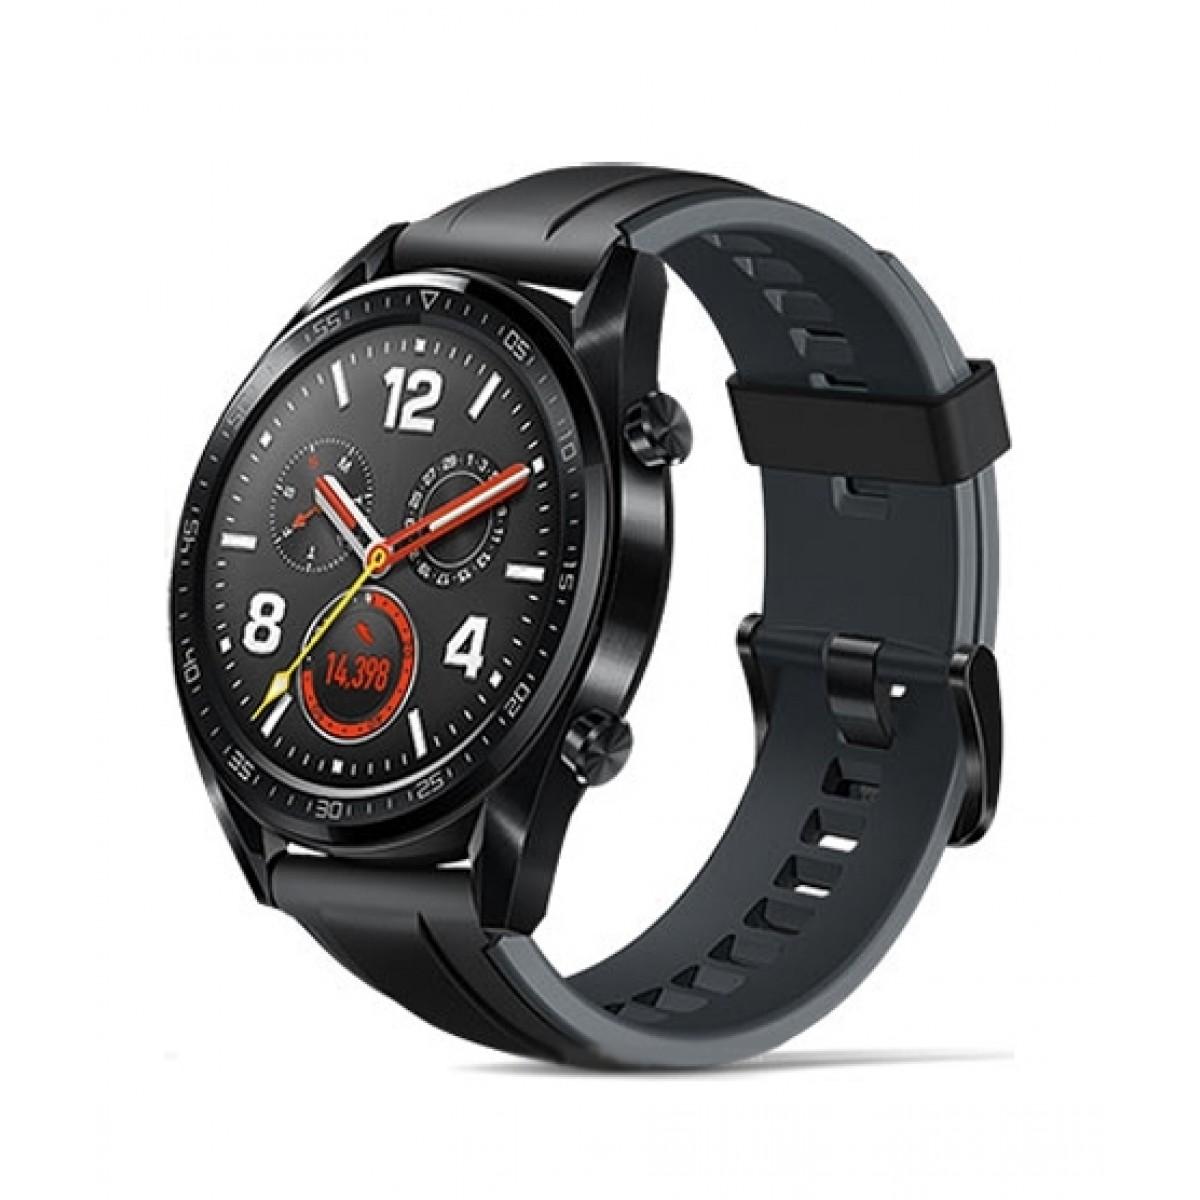 Huawei Watch GT Smartwatch Black Stainless Steel